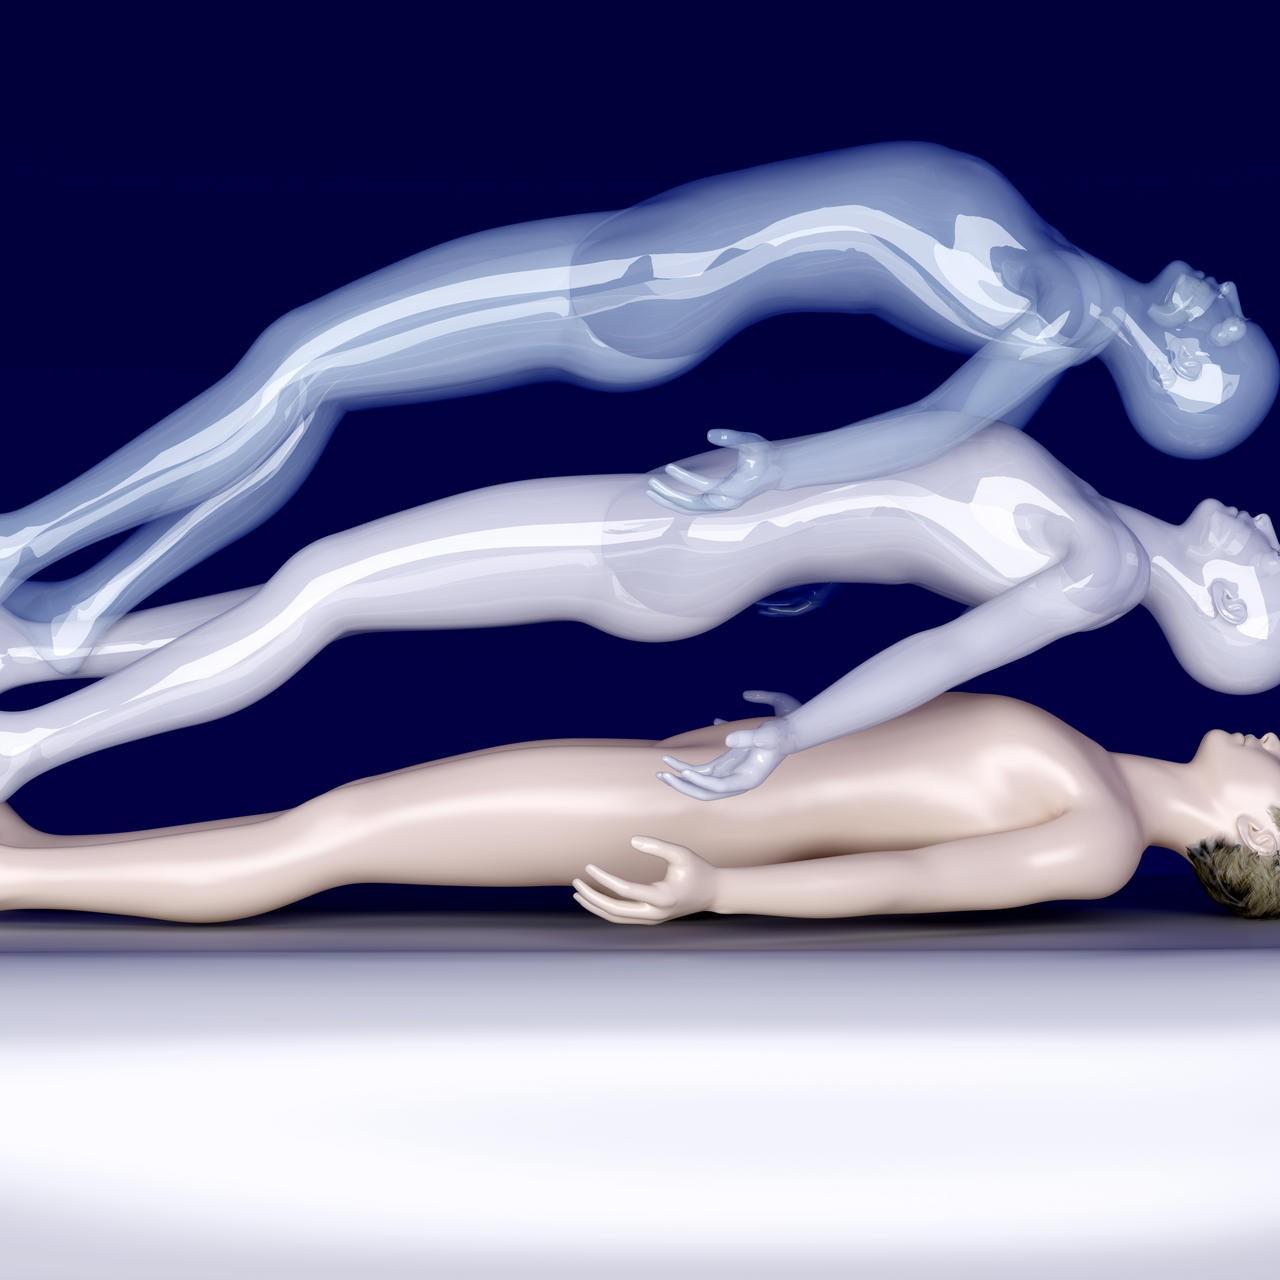 Sleep paralysis can be an indicator of neurodegenerative